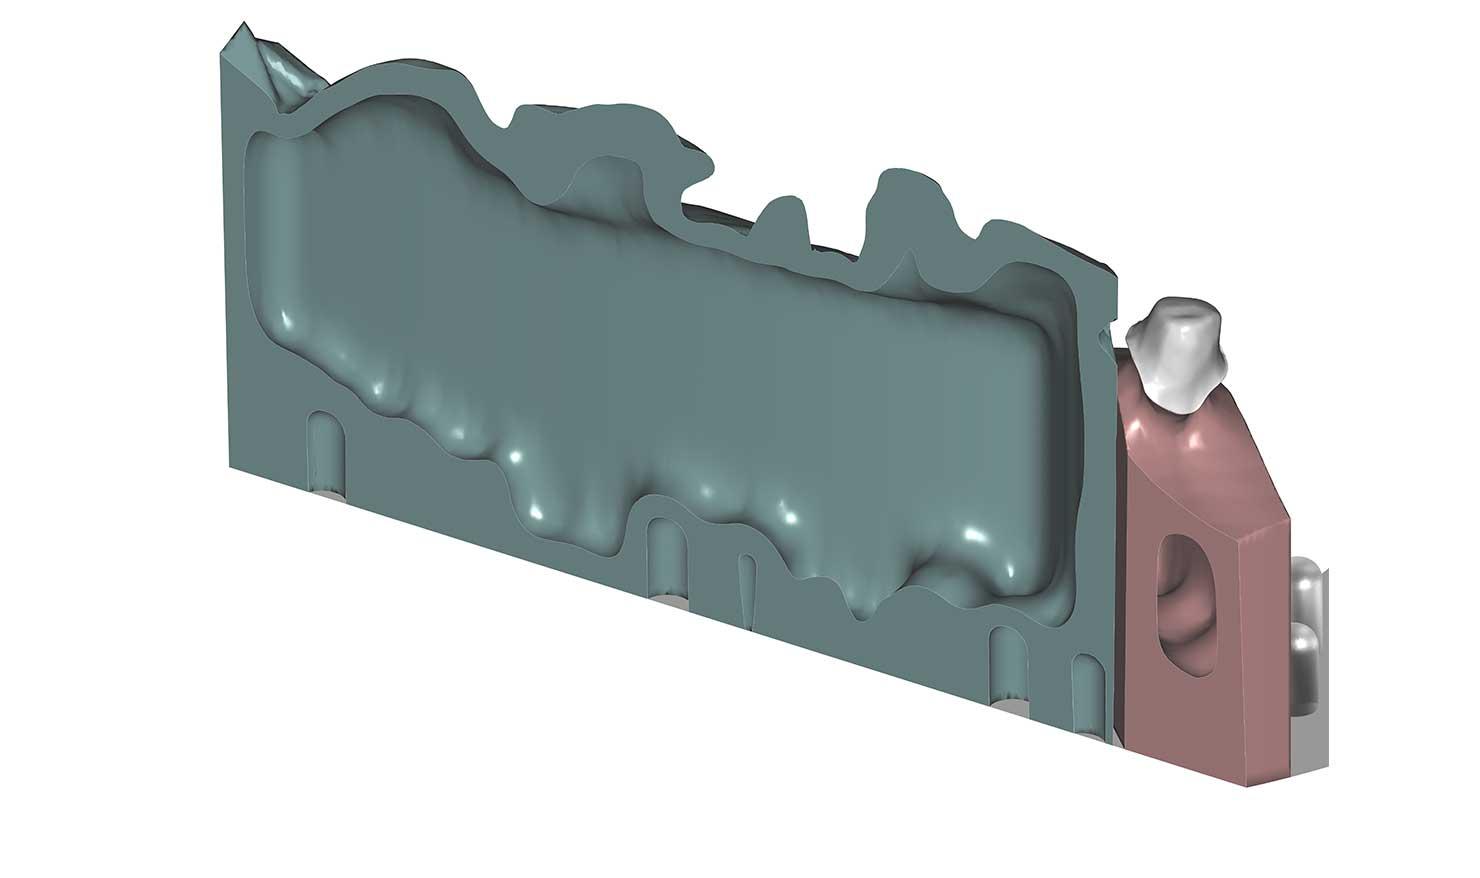 product-maincarousel-model-creator-hollow-mode